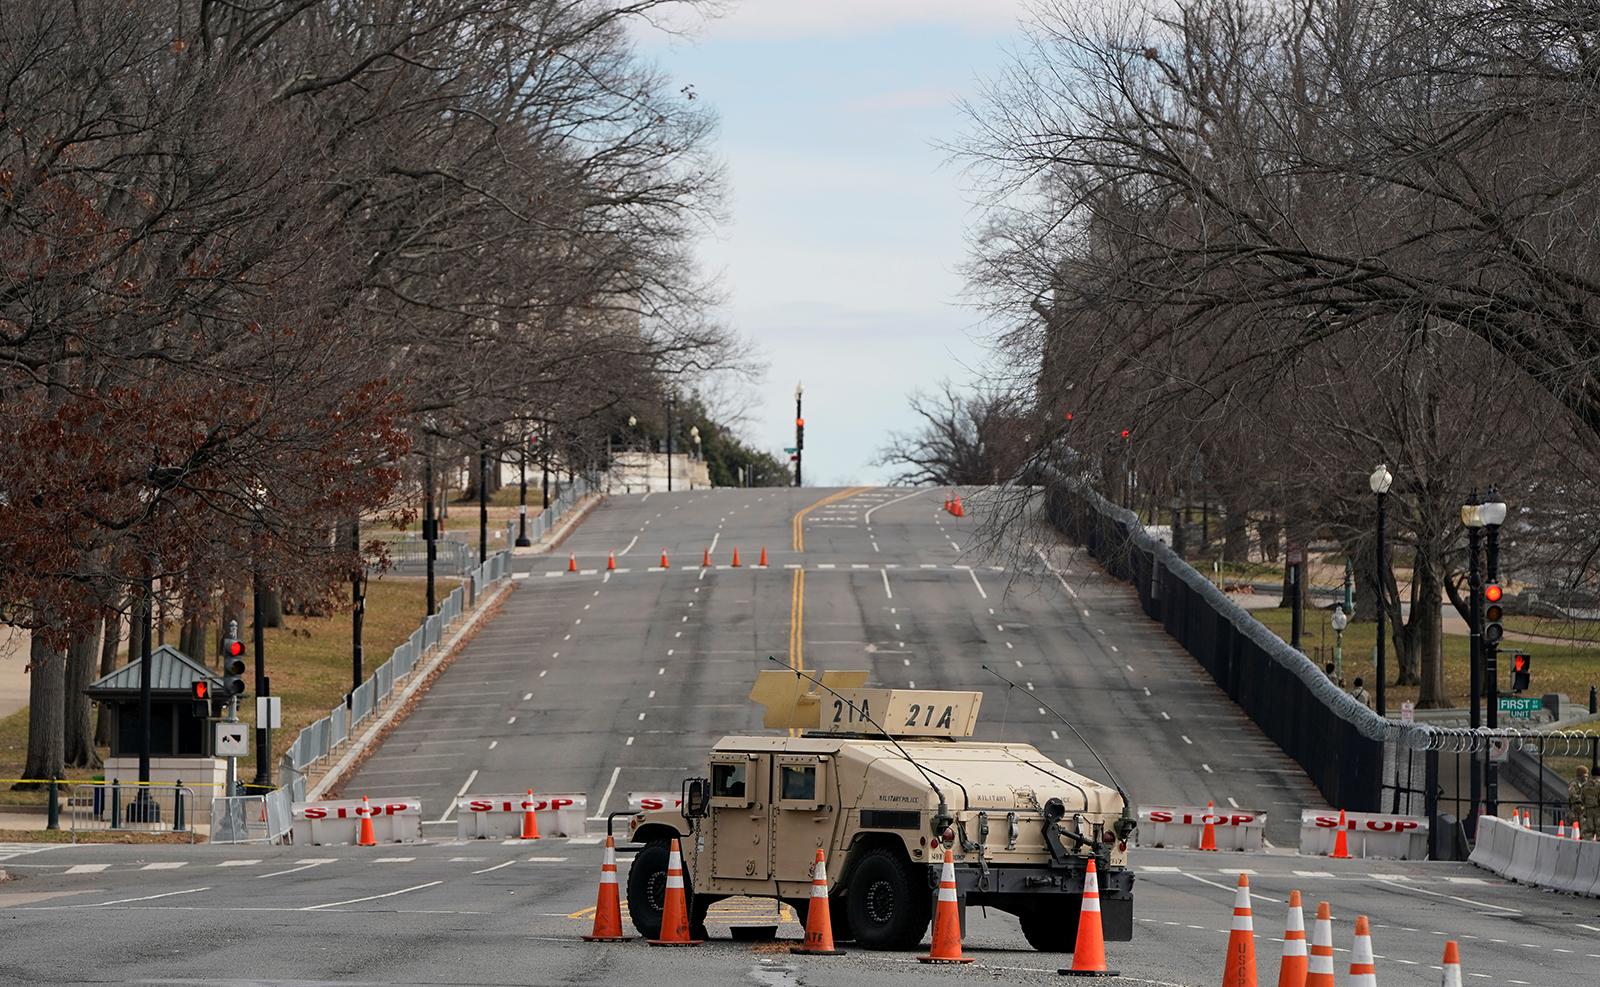 A National Guard vehicle is seen around the U.S. Capitol ahead of U.S. President-elect Joe Biden's inauguration, in Washington, U.S., January 17, 2021. Reuters